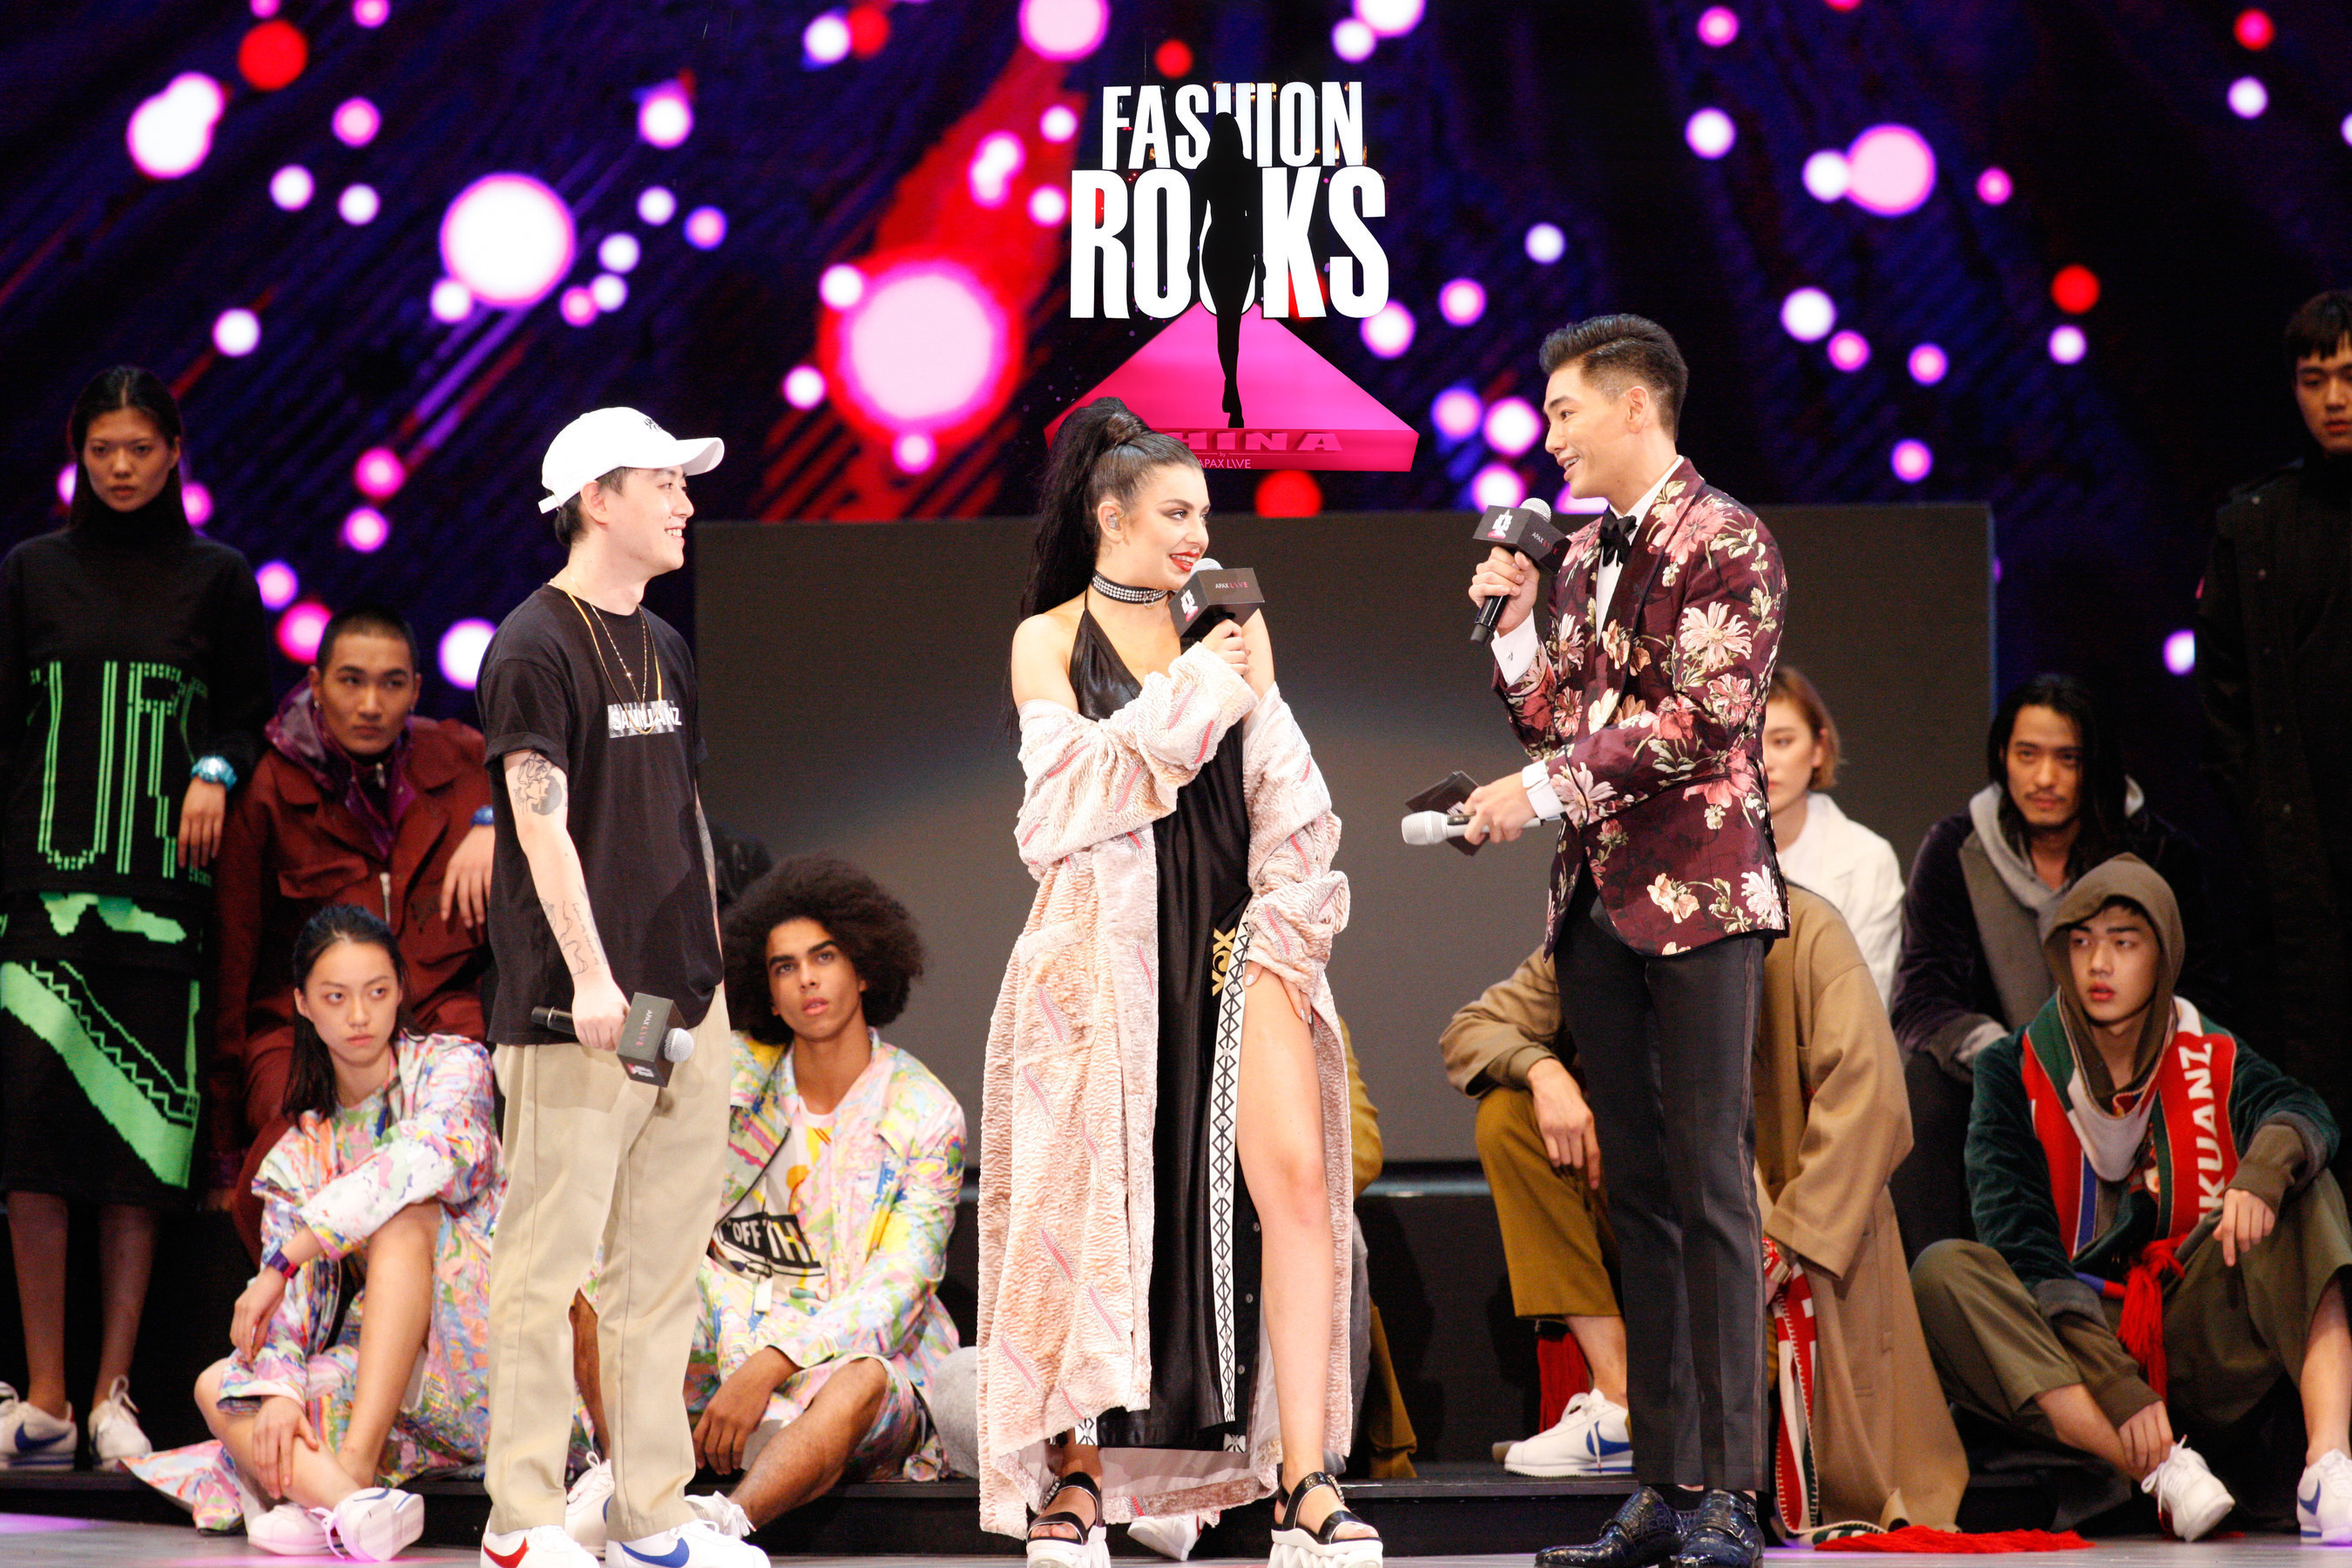 Charli XCX x SANKUANZ, Shanghai, 14th Oct 2016, First Fashion Rocks in Asia presented by APAX LIVE